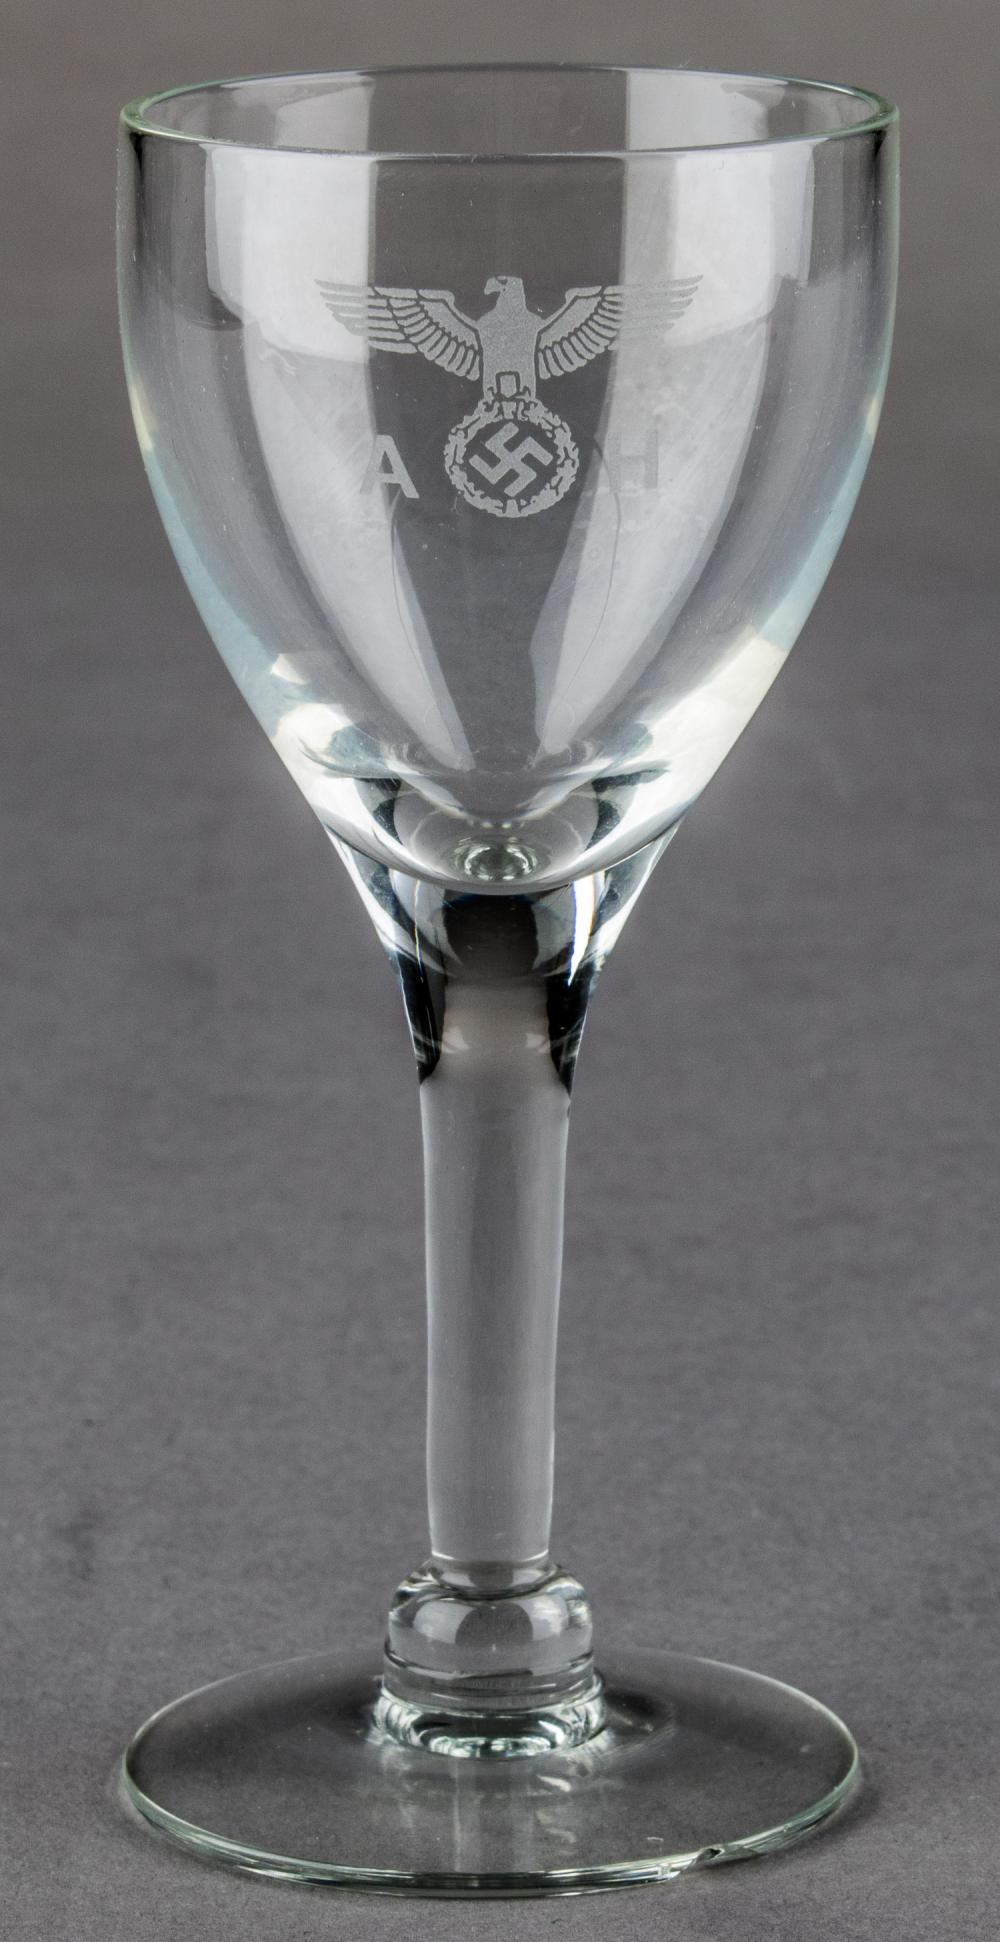 ADOLF HITLER SCHNAPPS GLASS